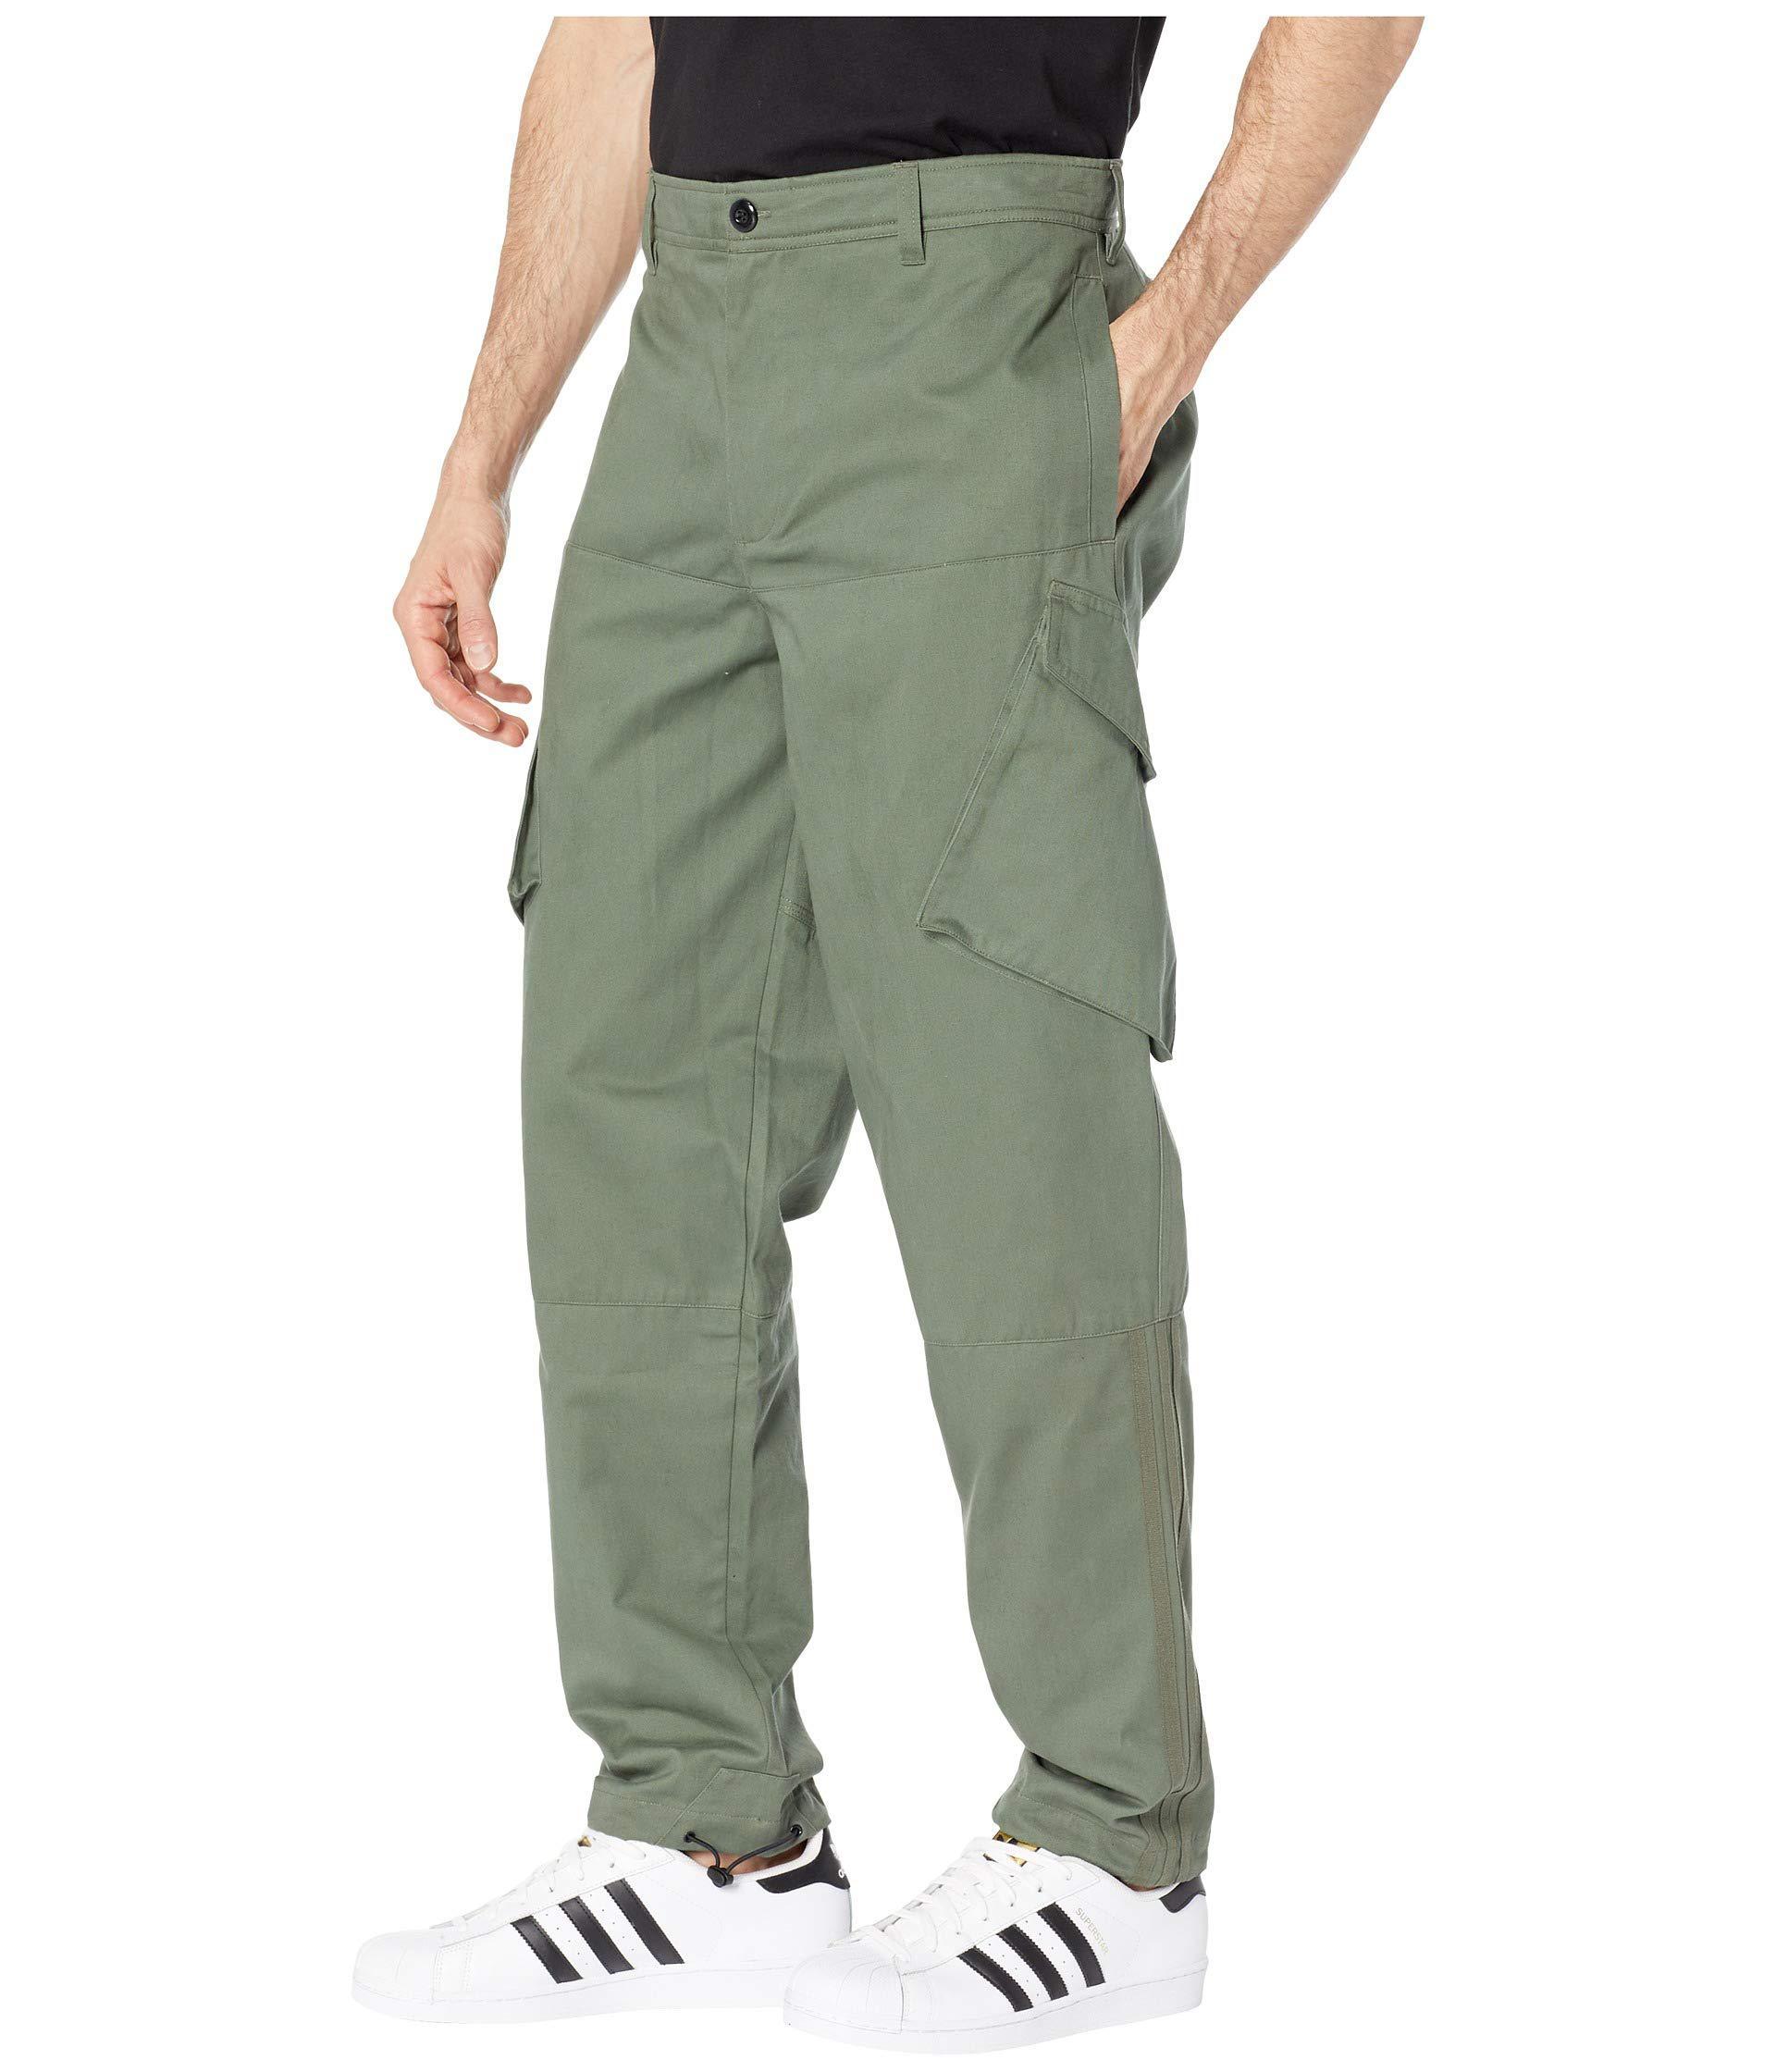 0c79e3da93 Lyst - adidas Originals Cargo Pants (base Green) Men s Casual Pants in Green  for Men